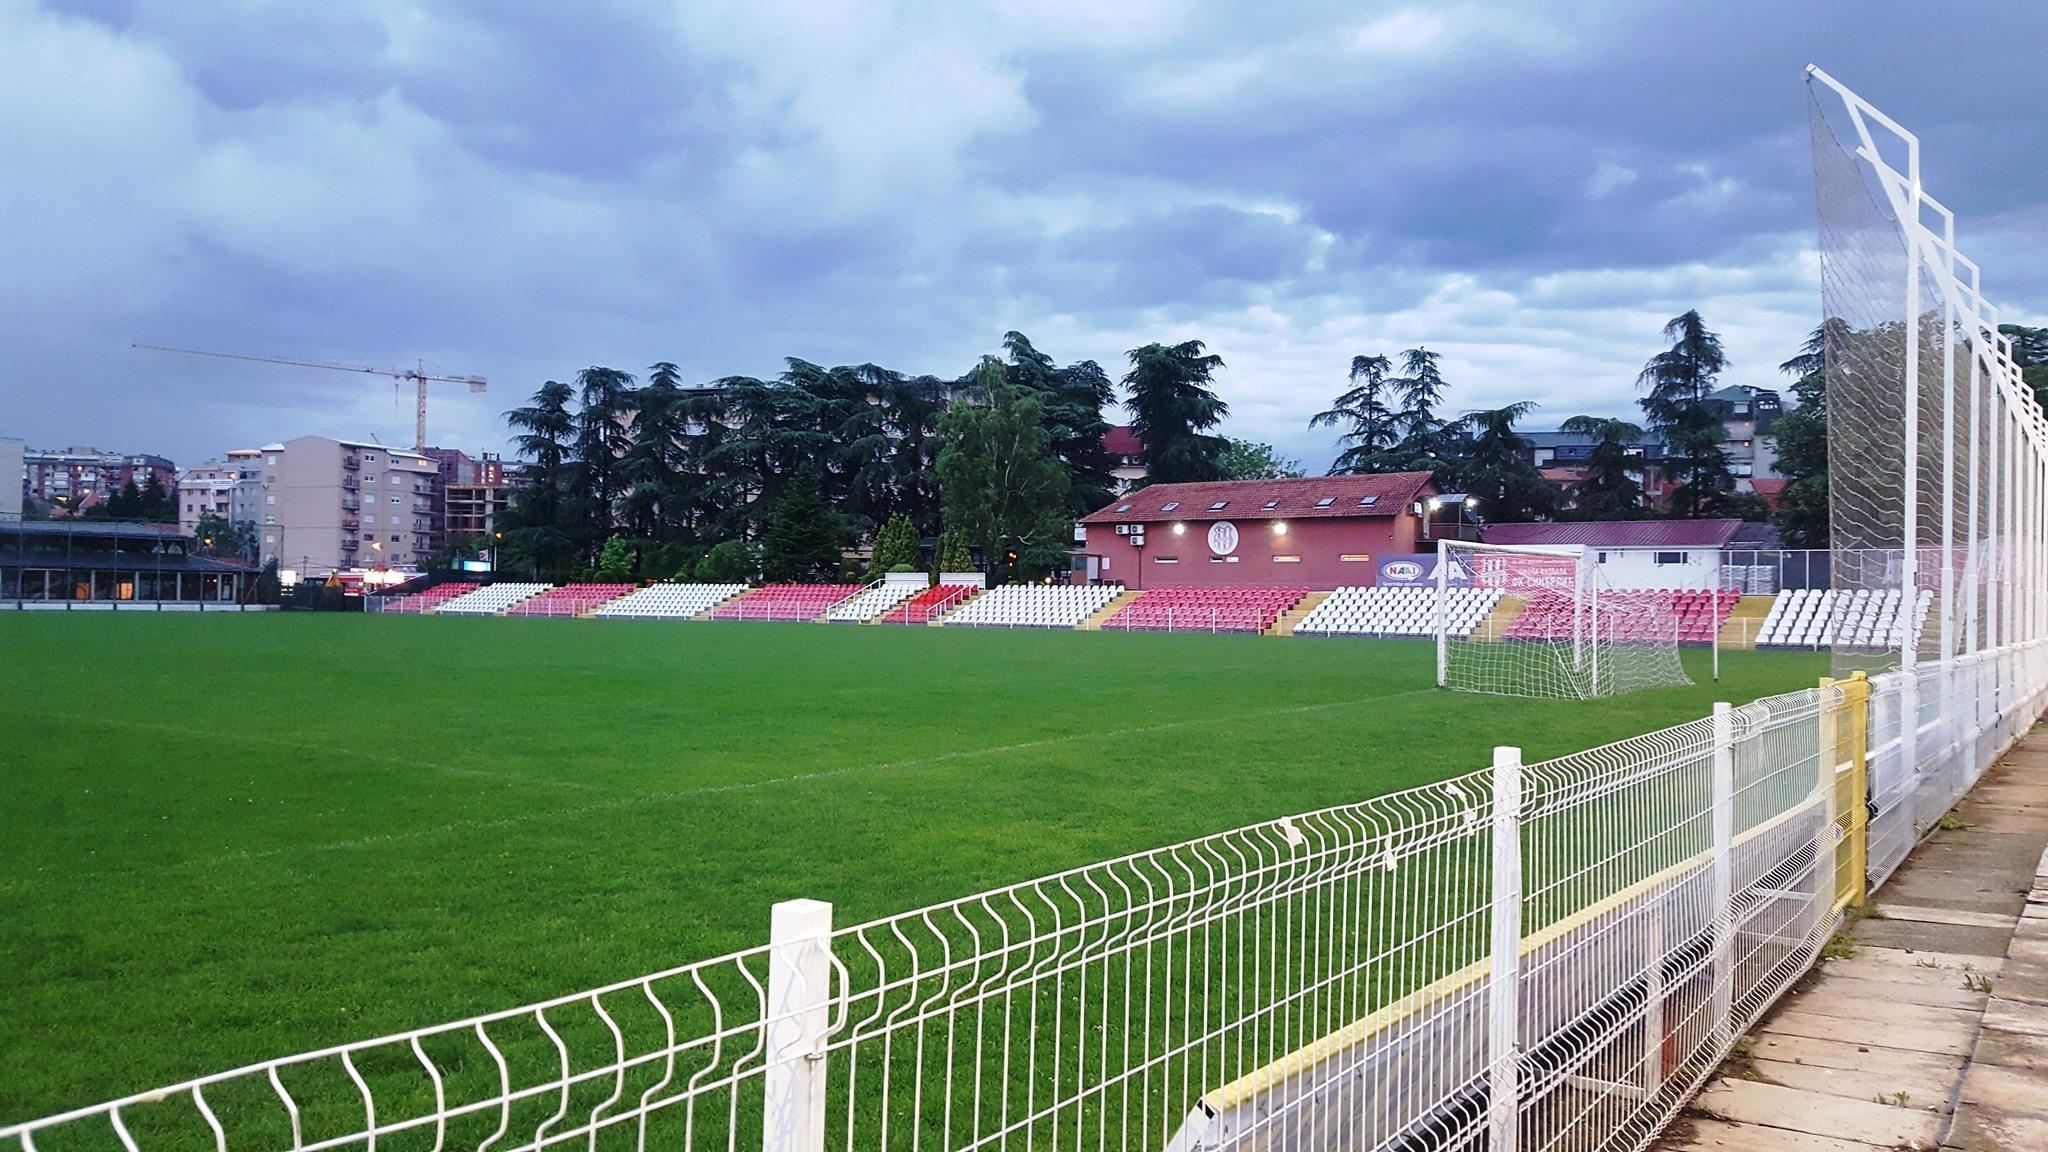 STADION FK SINĐELIĆ BEOGRAD